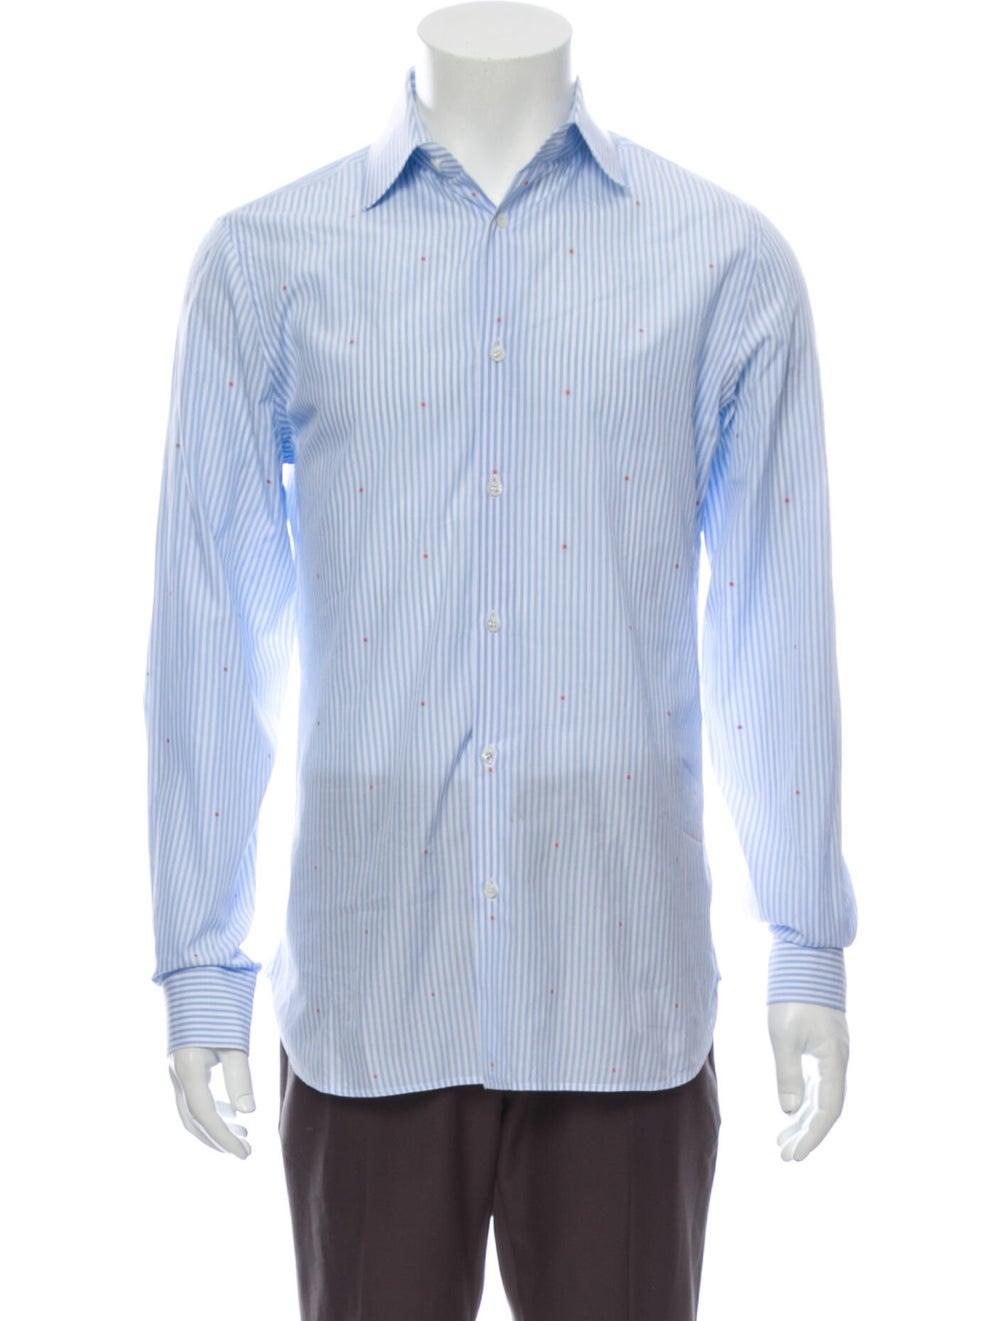 Gucci 2018 Striped Shirt Blue - image 1